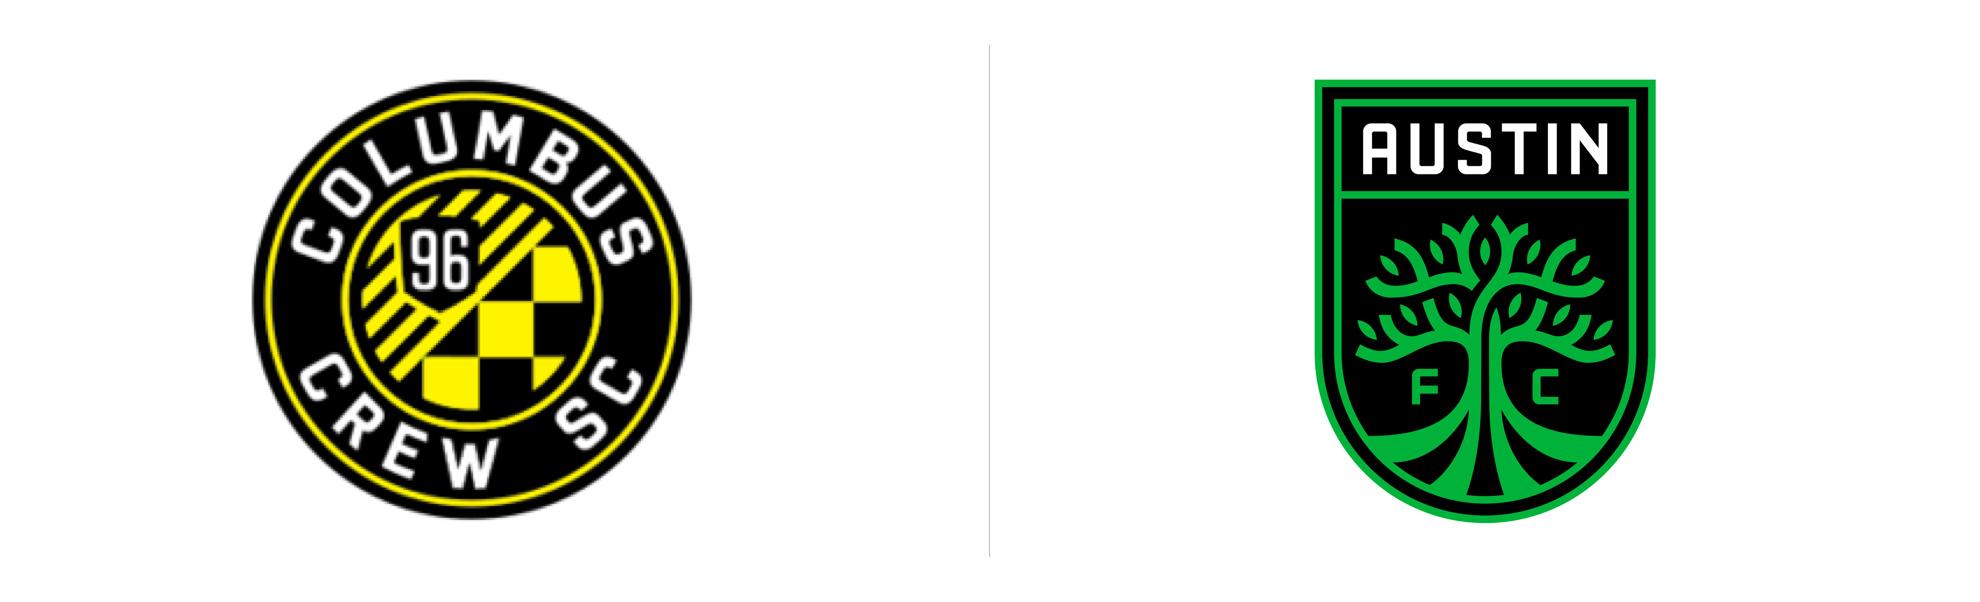 austin fc nowe logo